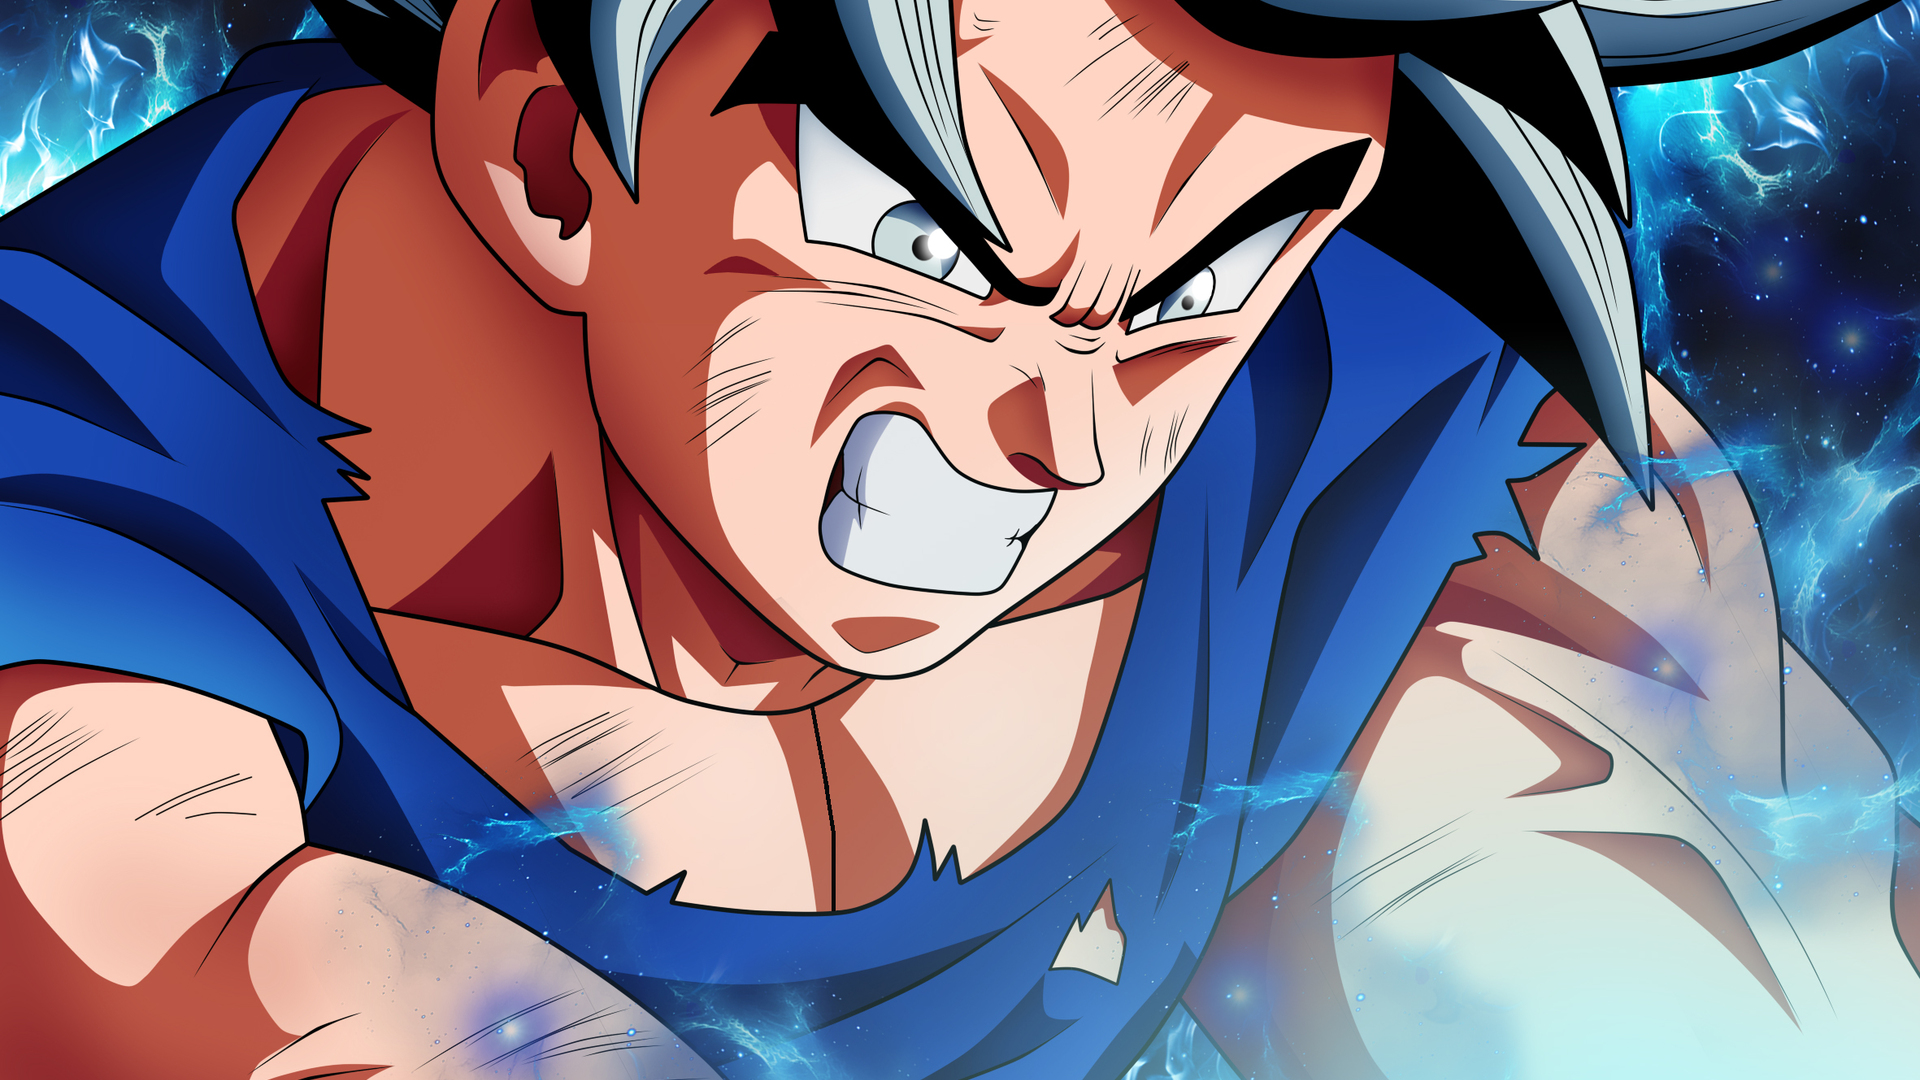 1920x1080 Goku Dragon Ball Super Anime HD 2018 Laptop Full HD 1080P HD 4k Wallpapers, Images ...